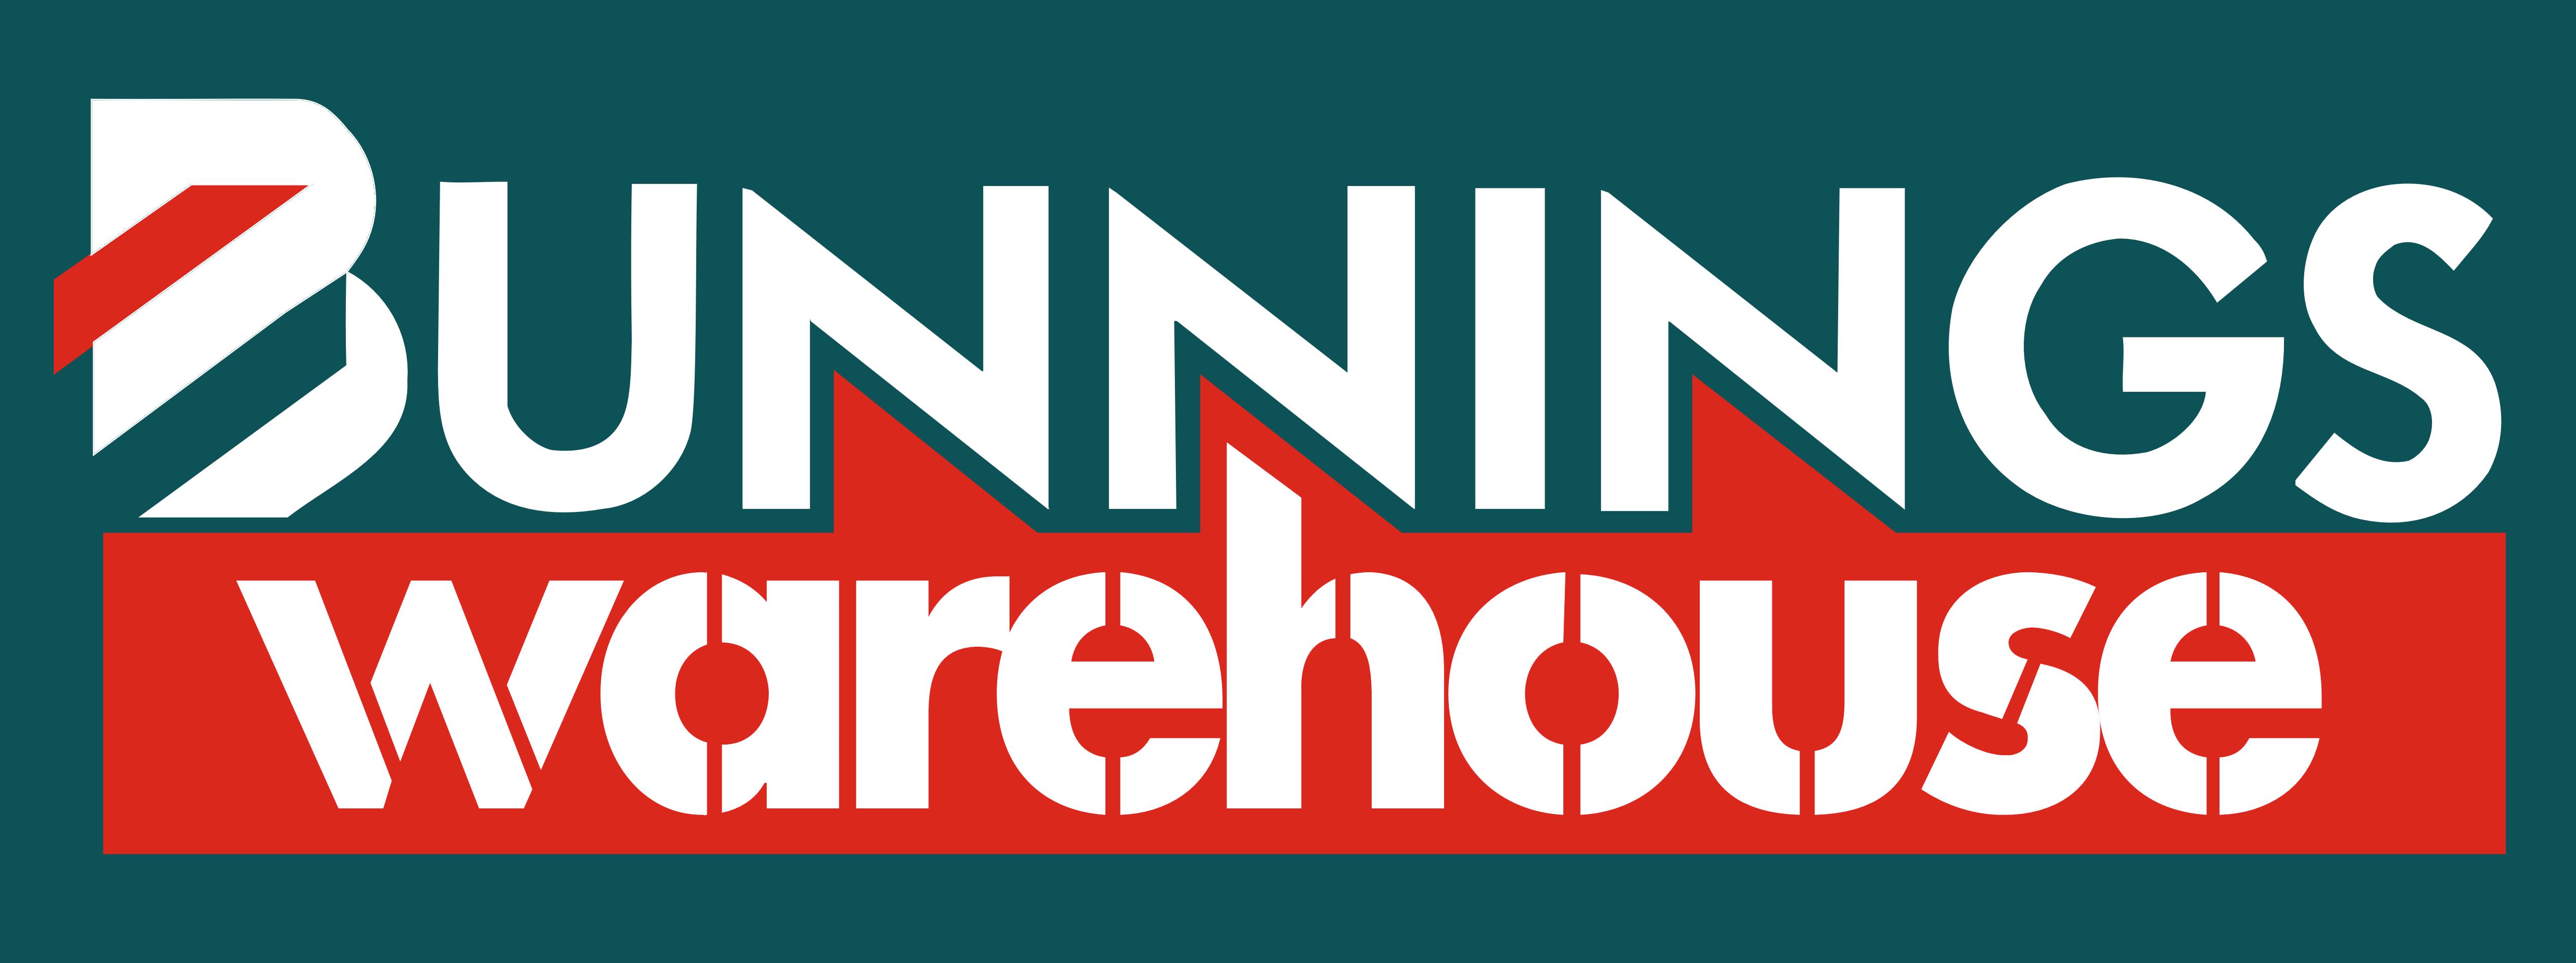 https://coastaltwist.org.au/wp-content/uploads/2021/06/Bunnings_Warehouse_logo_background.png